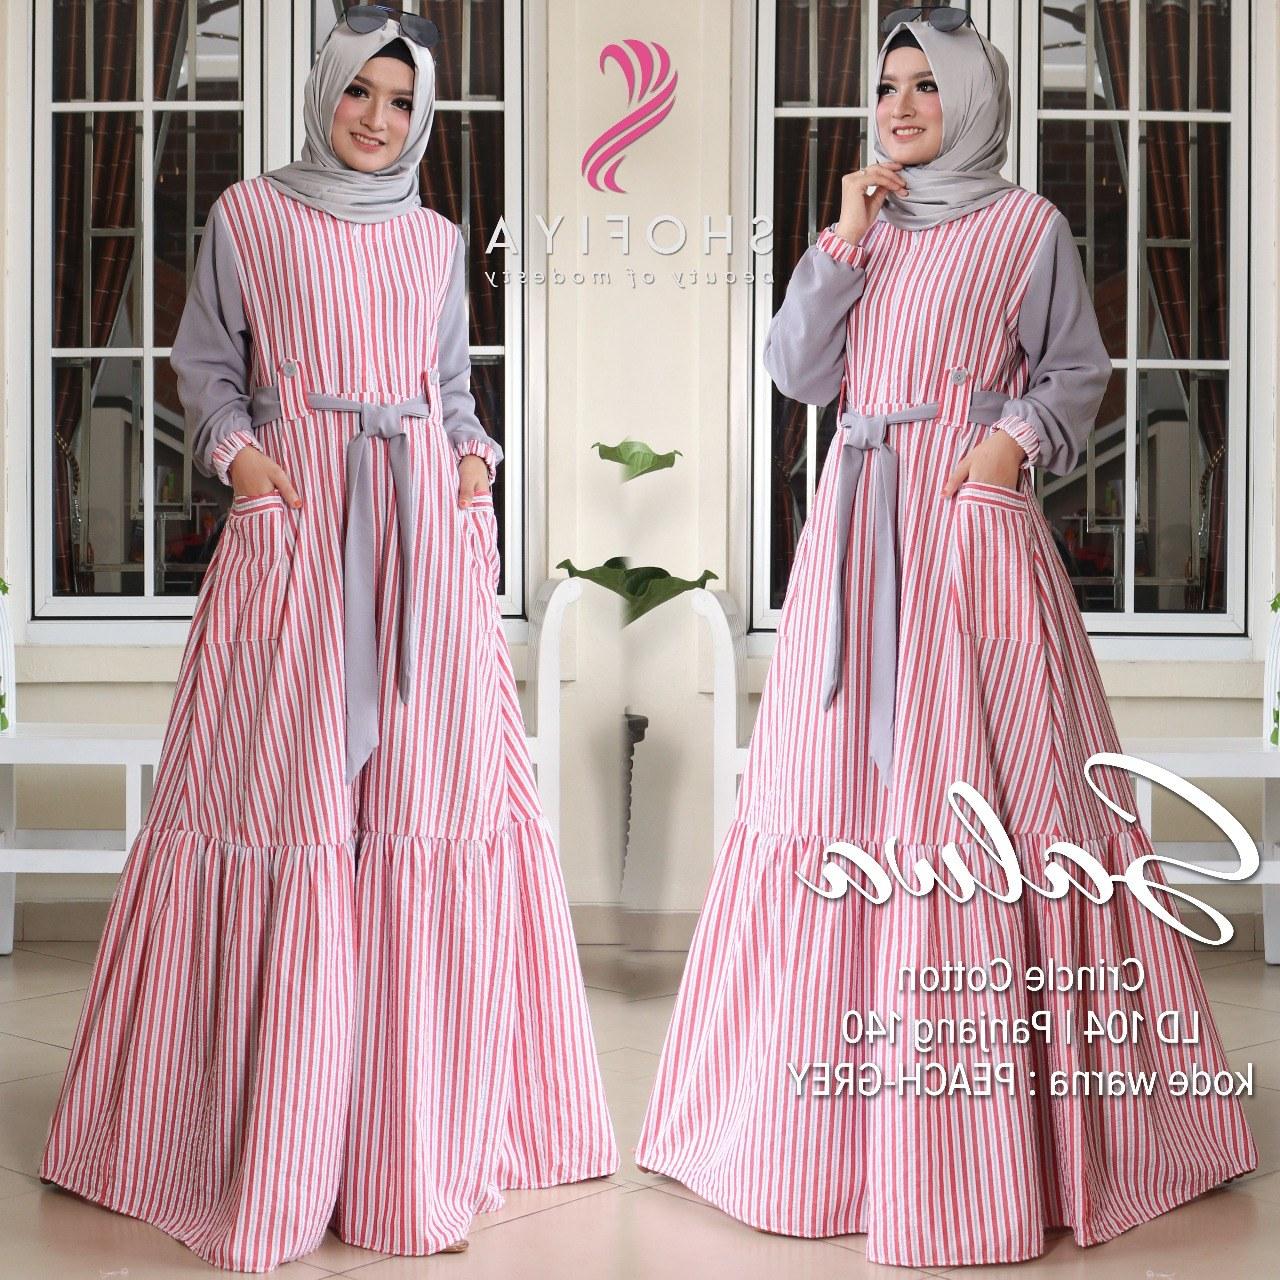 Model Model Baru Baju Lebaran Irdz Model Baju Gamis Terbaru Lebaran Gambar islami